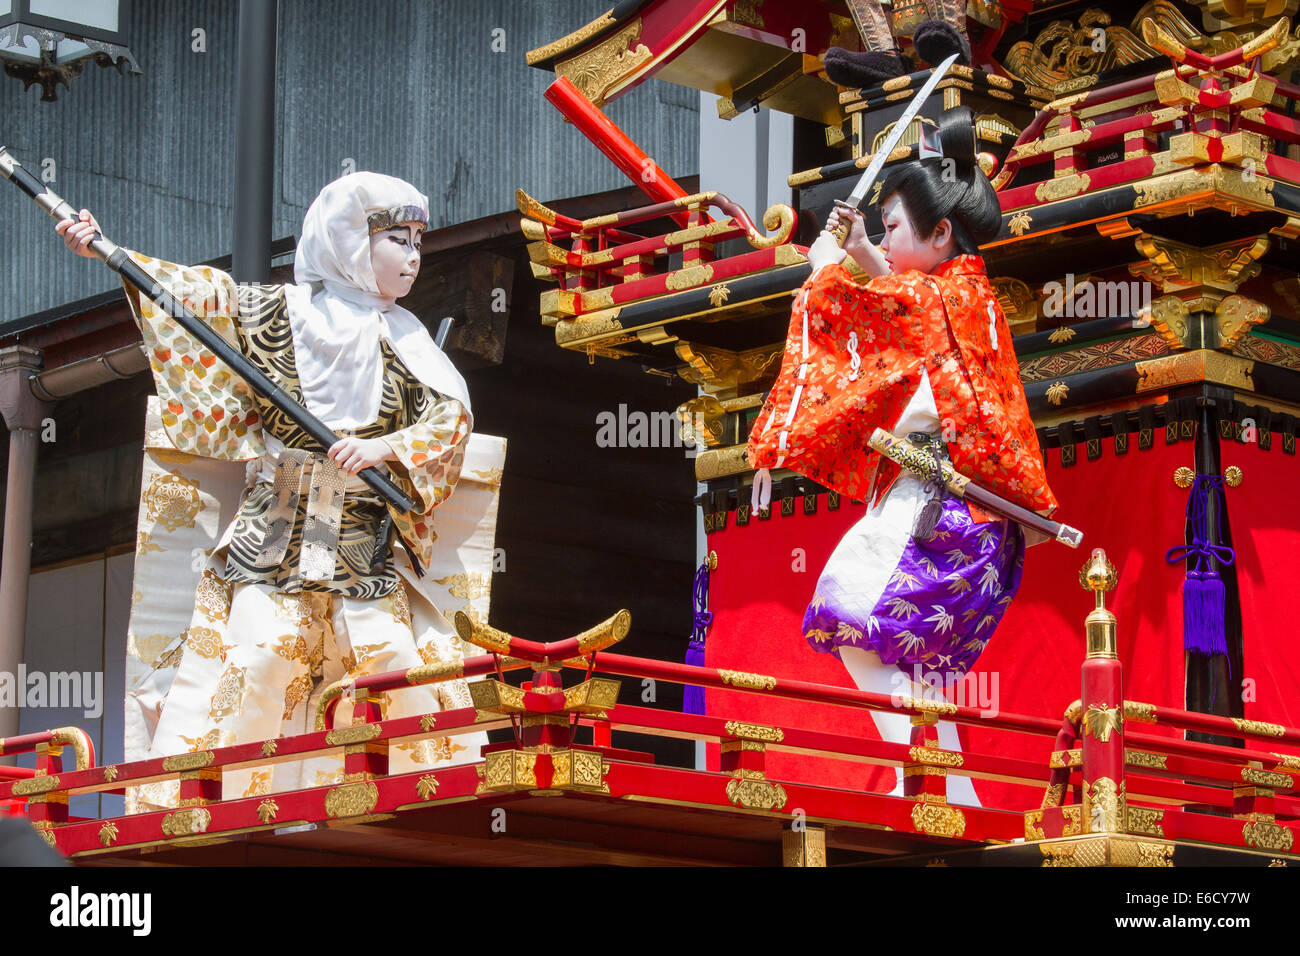 Children participating in a Kabuki performance atop a yatai (festival float) during Furukawa Festival, Hida-Furukawa, - Stock Image